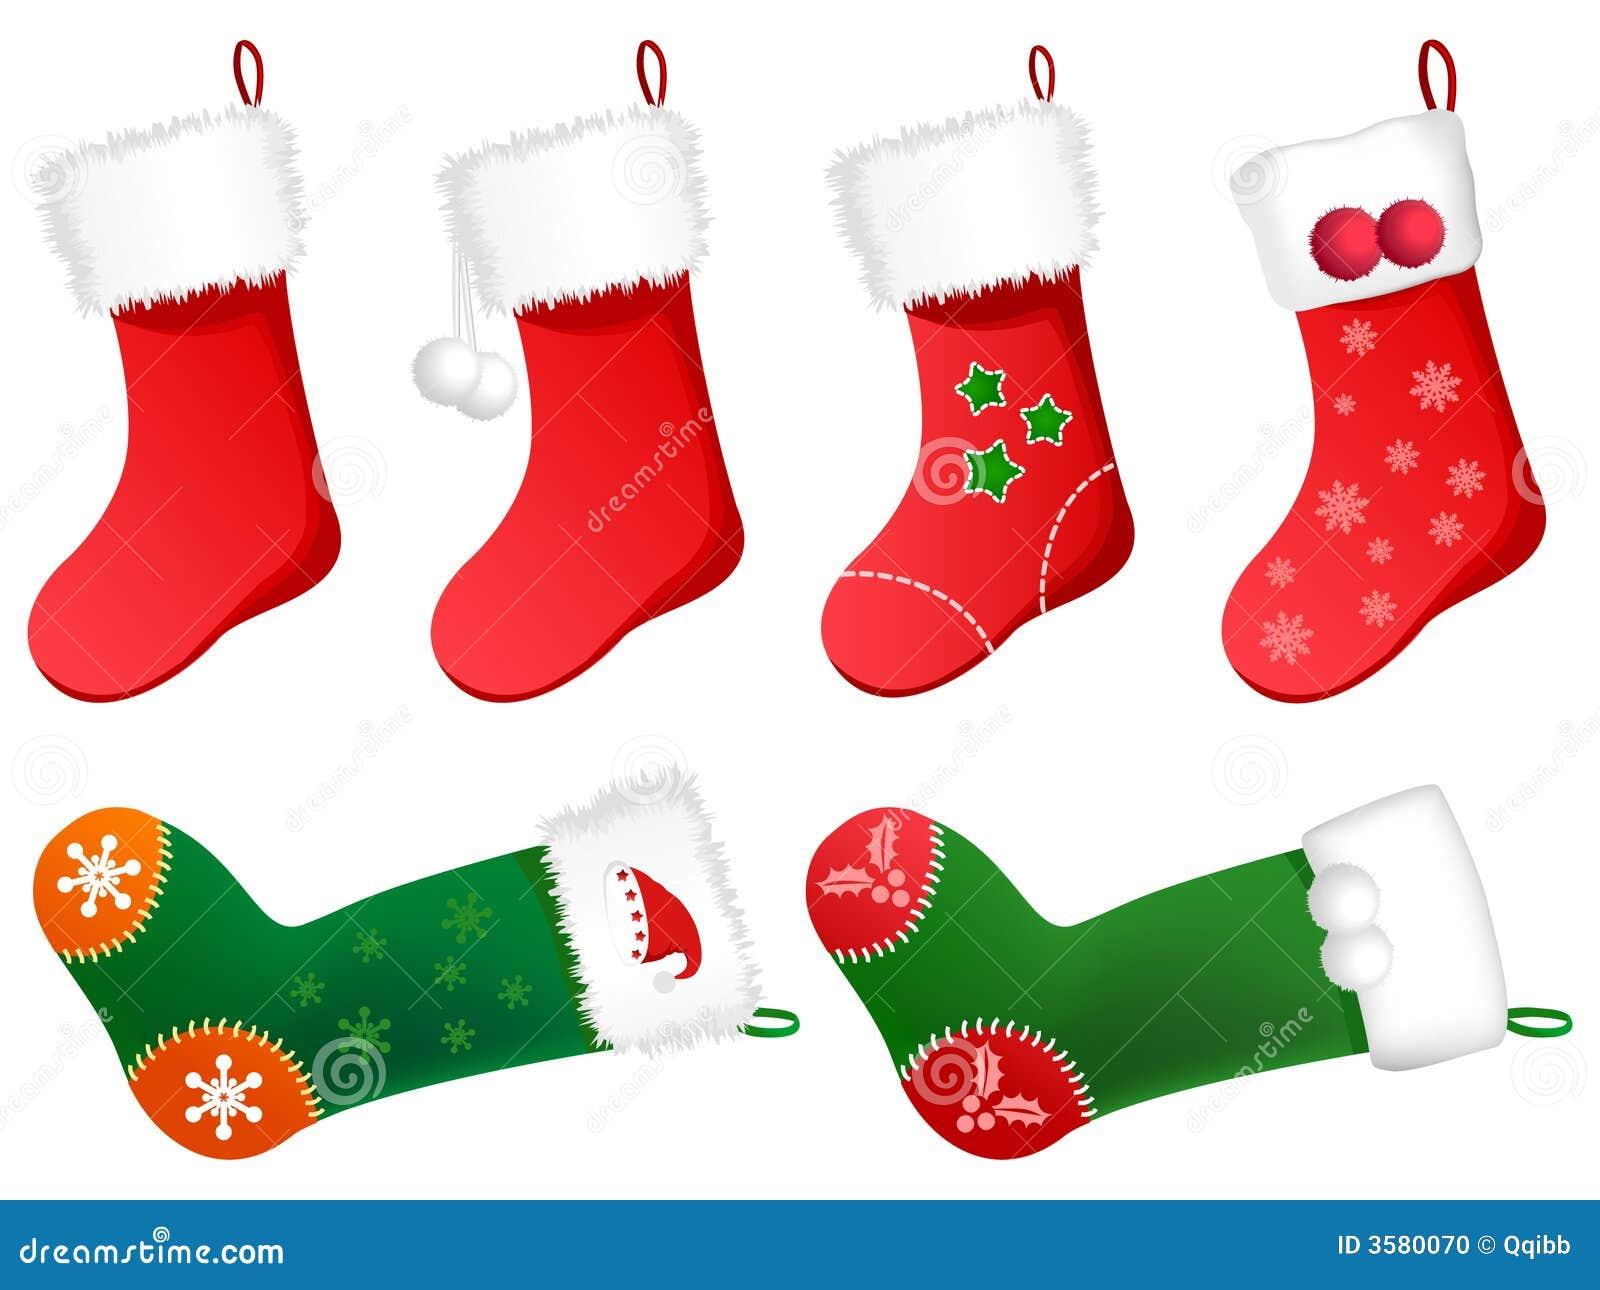 fa8b56f9c Cute Christmas Stockings stock illustration. Illustration of ...